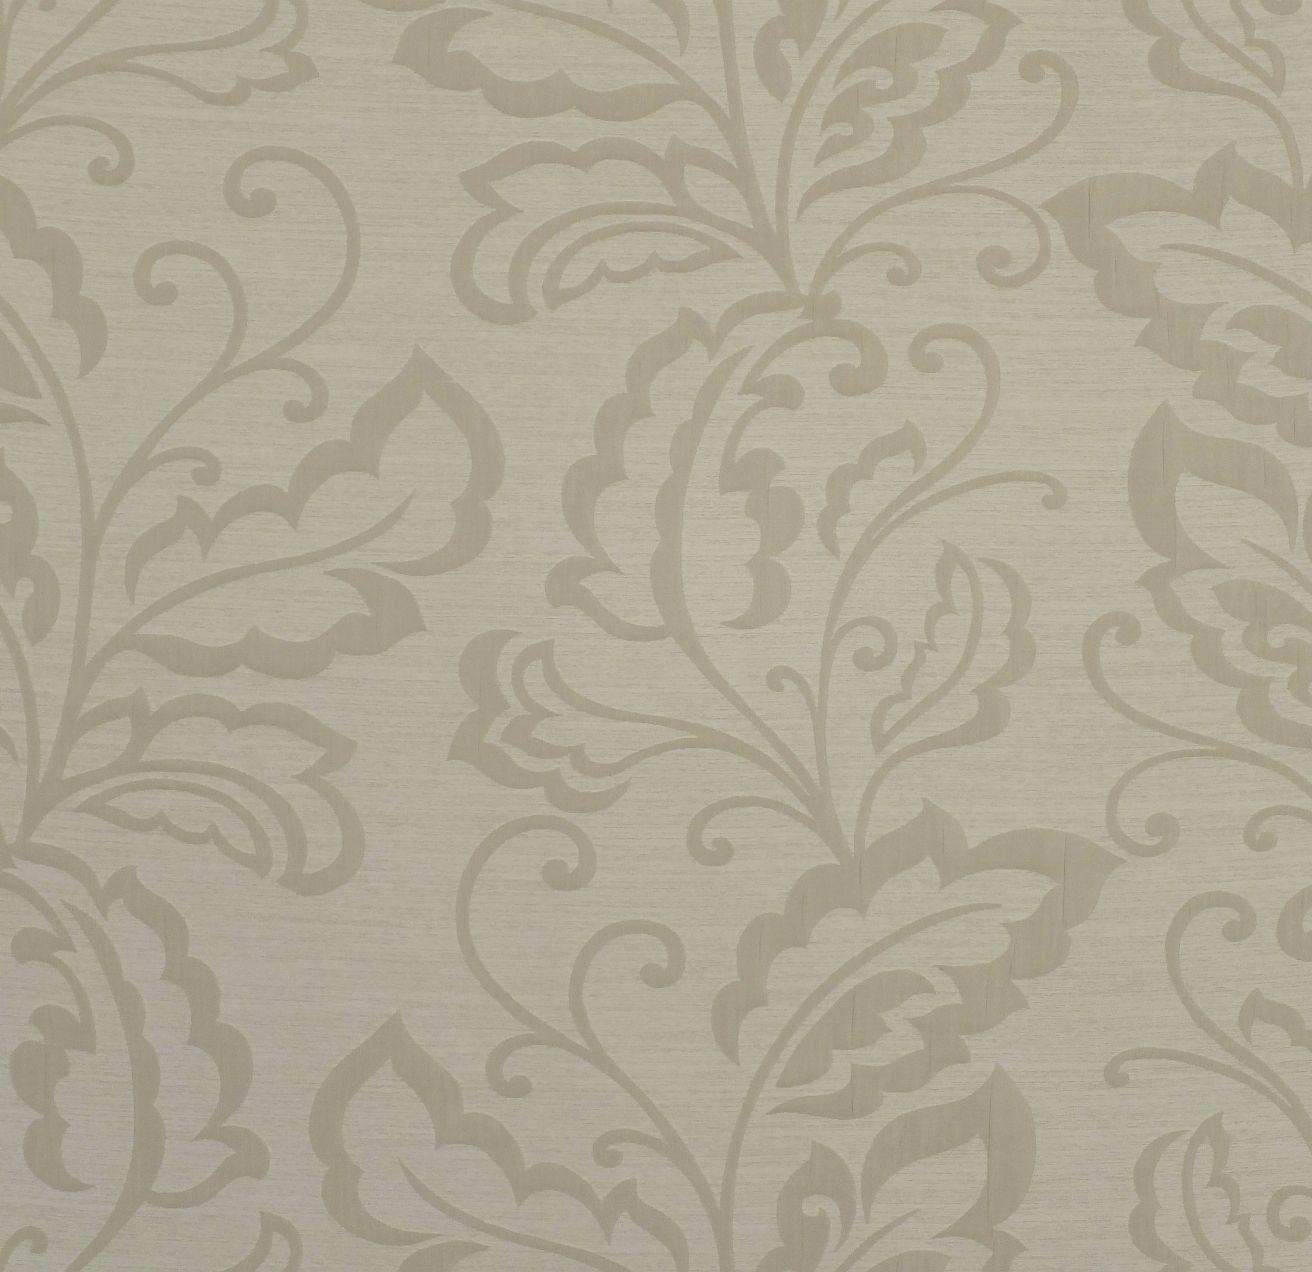 White leaf drapery fabric - Sandford Vista by Charles Parsons Interiors #white #neutral #vine #leaf #fabric #drapery #curtain #charlesparsonsinteriors